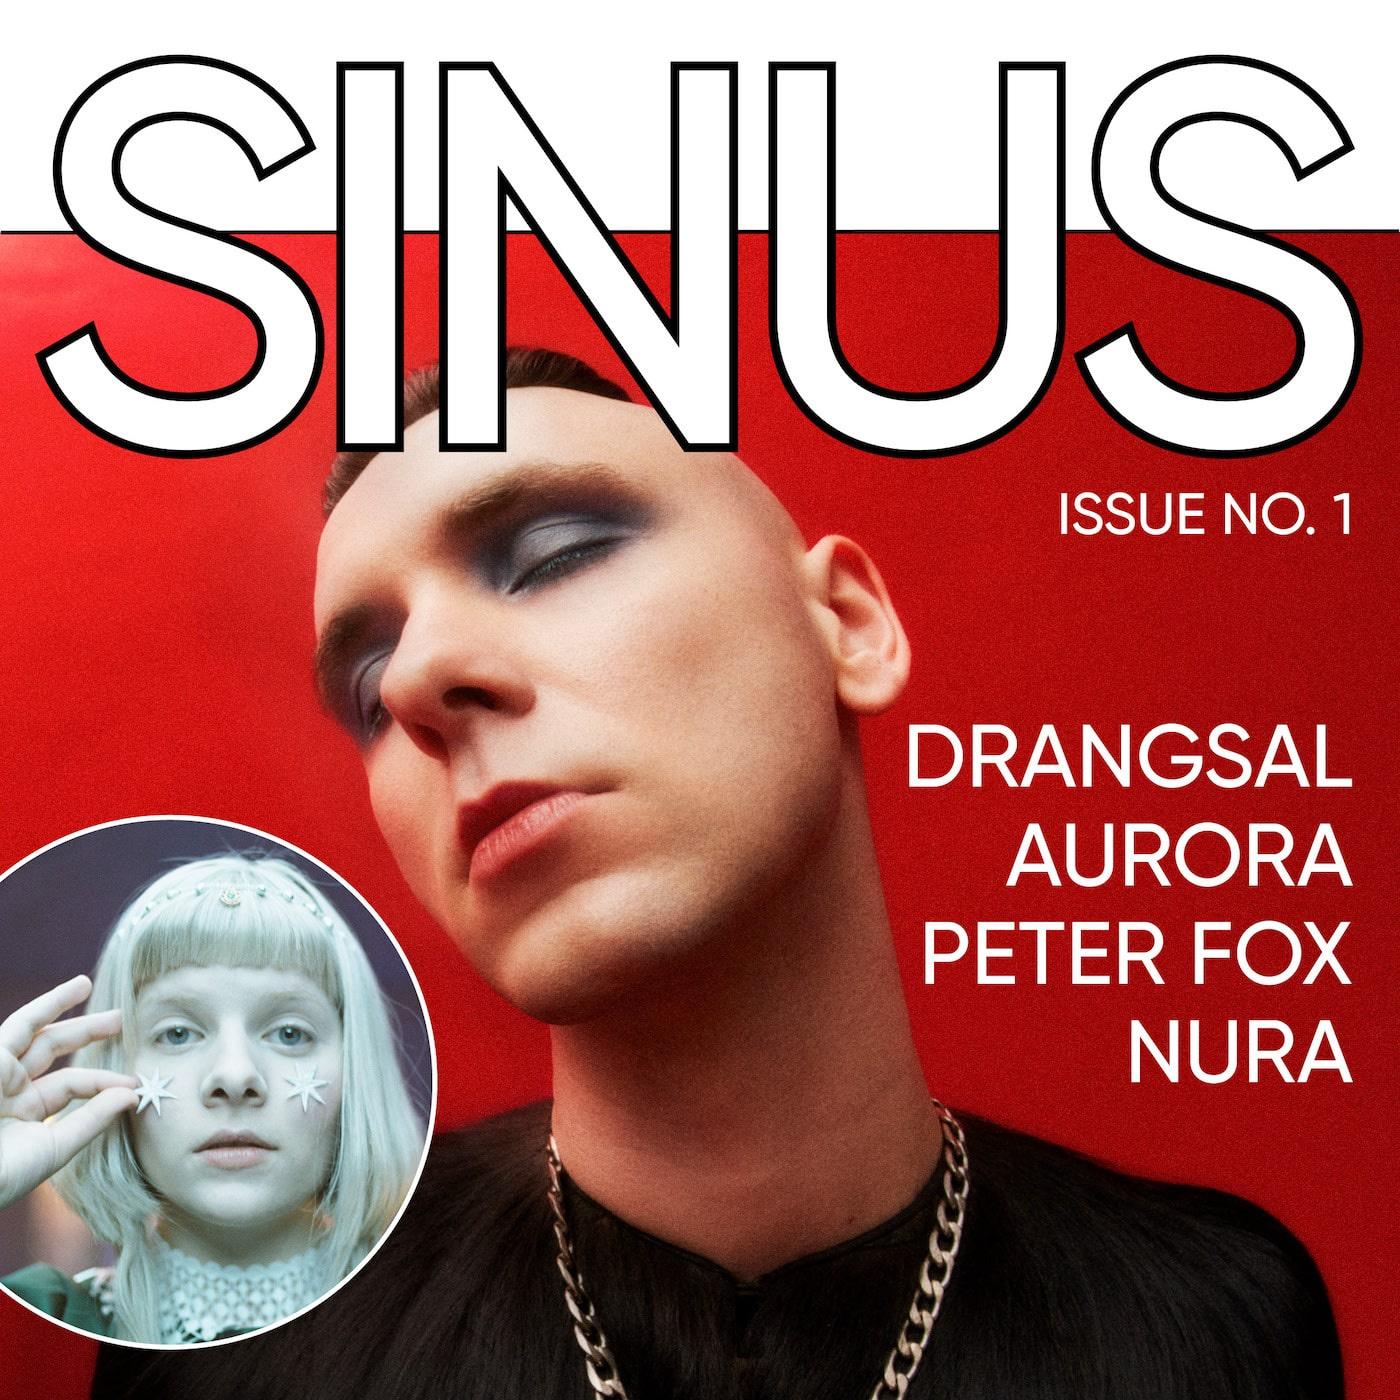 #1 Drangsal, Aurora, Peter Fox, Nura